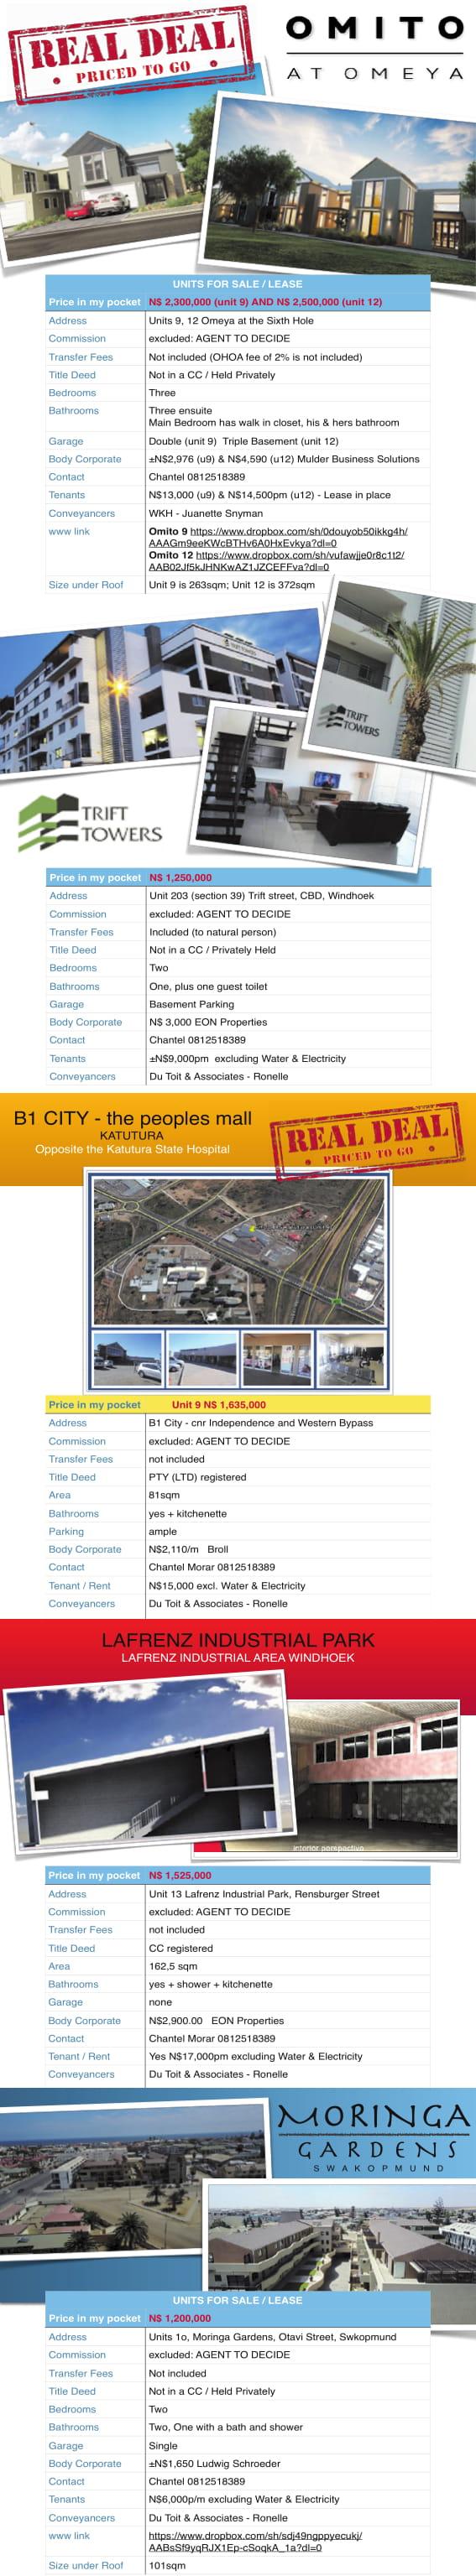 Real Deal Properties